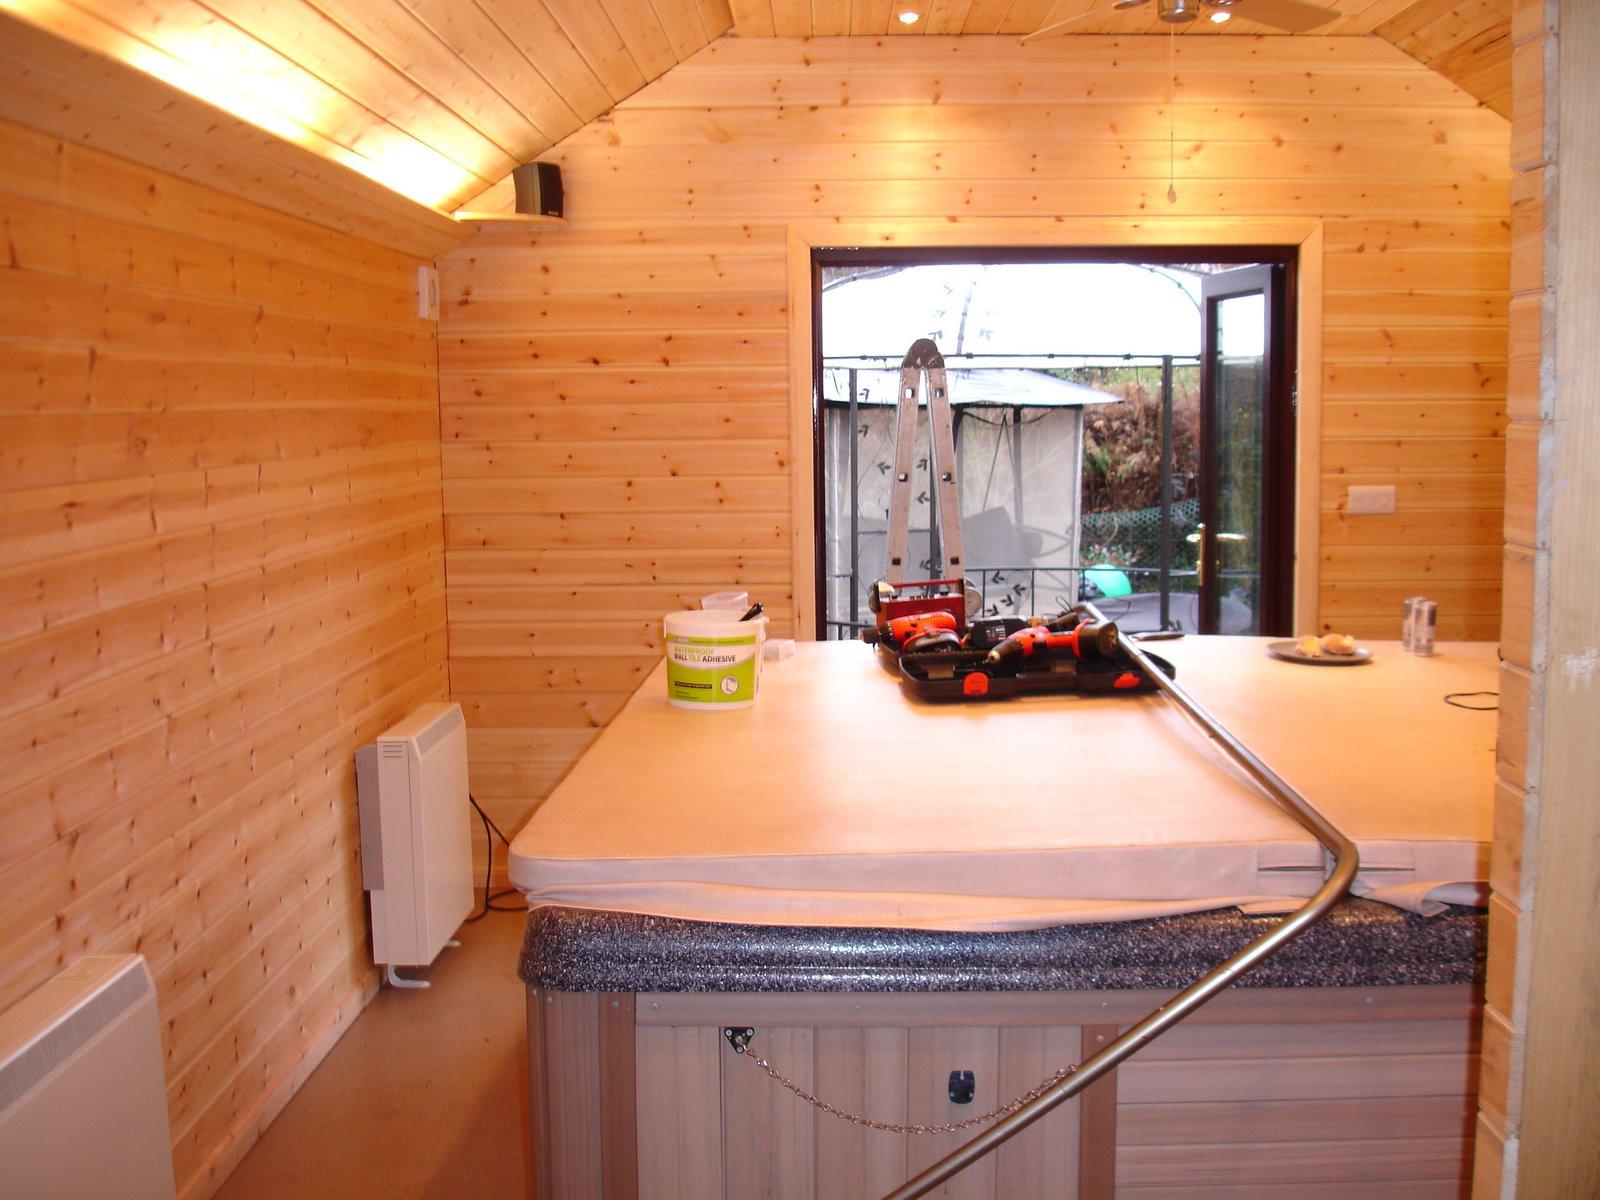 Bespoke Home Solutions Diy Log Cabin Hot Tub Extension